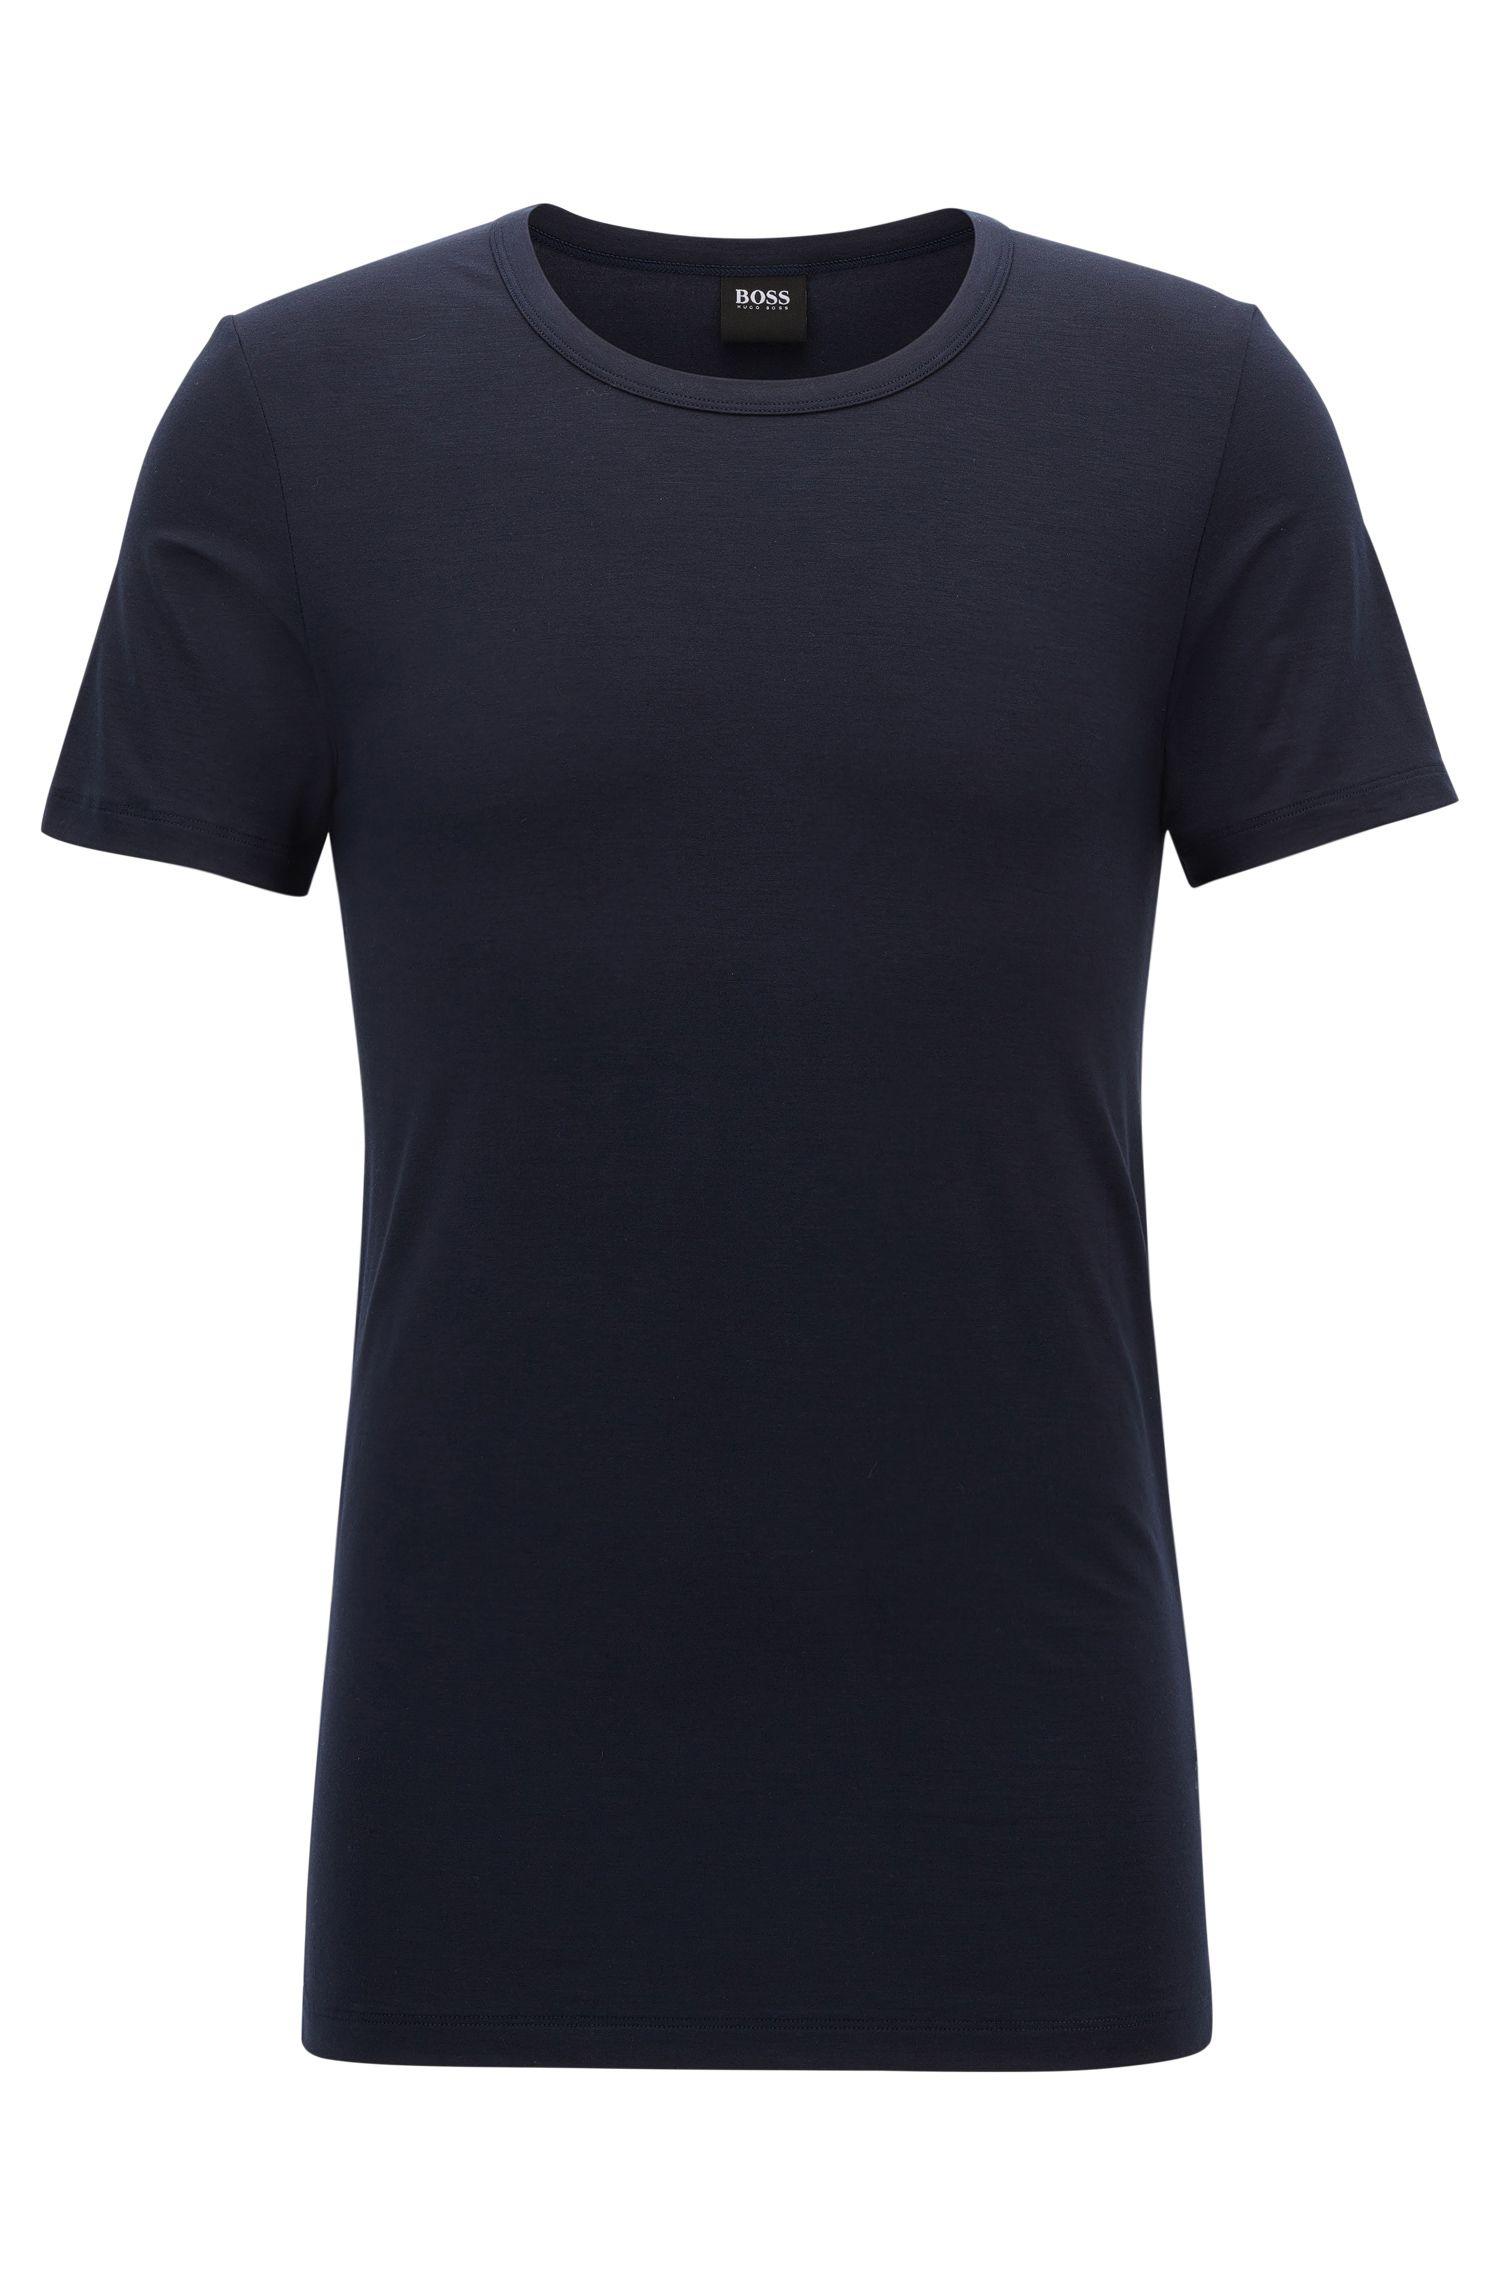 Camiseta con cuello redondo de punto en mezcla de modal con elástico